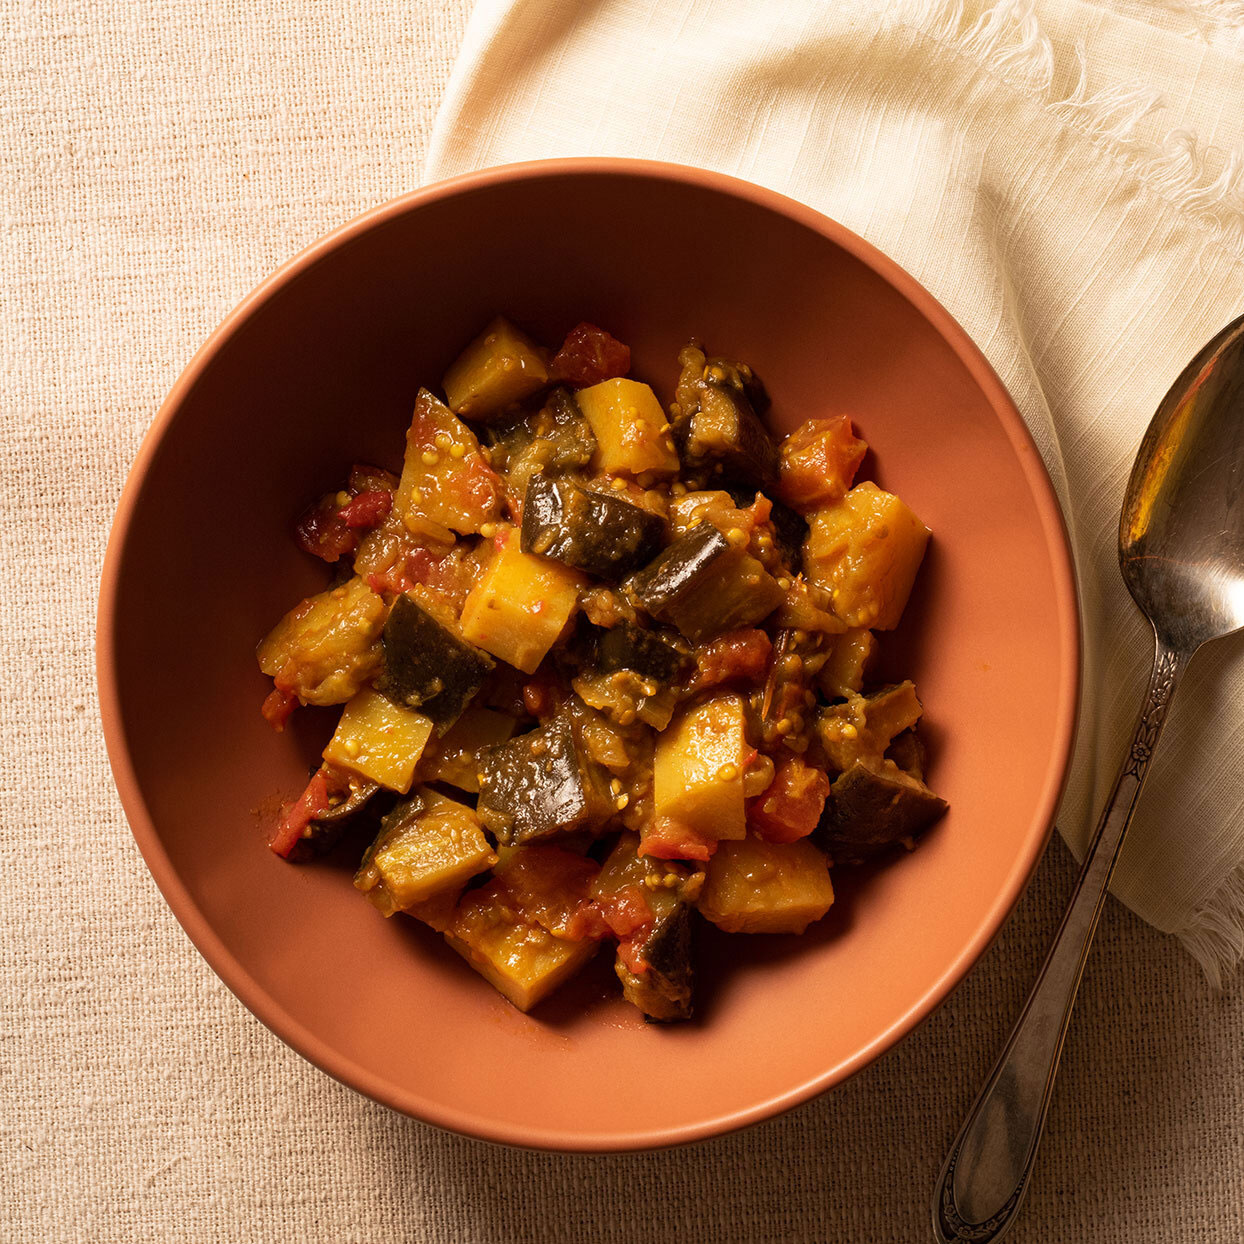 Yatimcheh (Iranian Eggplant, Tomato & Potato Stew) Trusted Brands